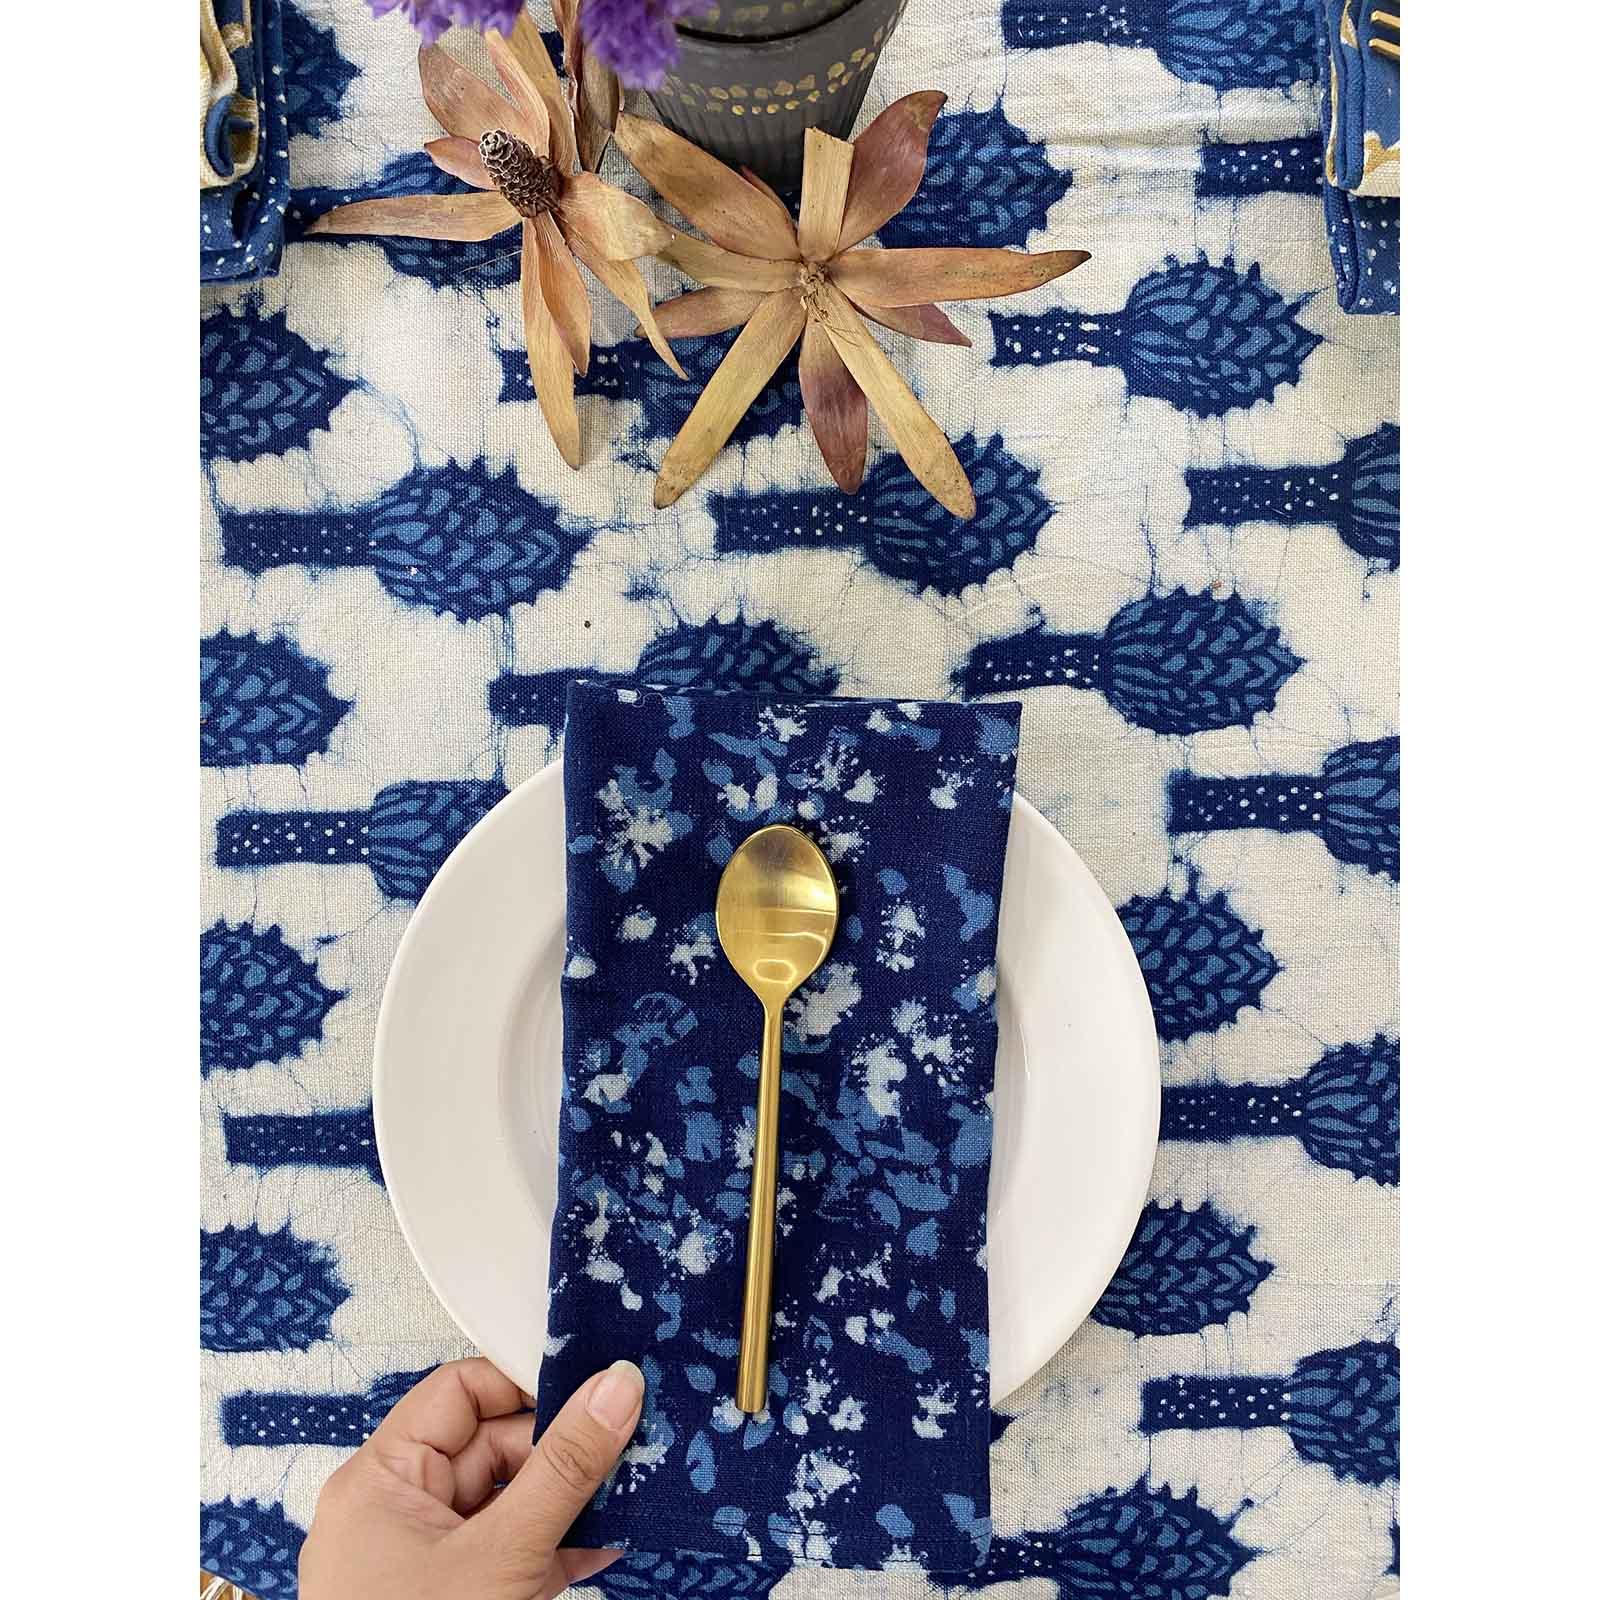 Nilampuri Blue And White Organic Cloth Napkins Ichcha